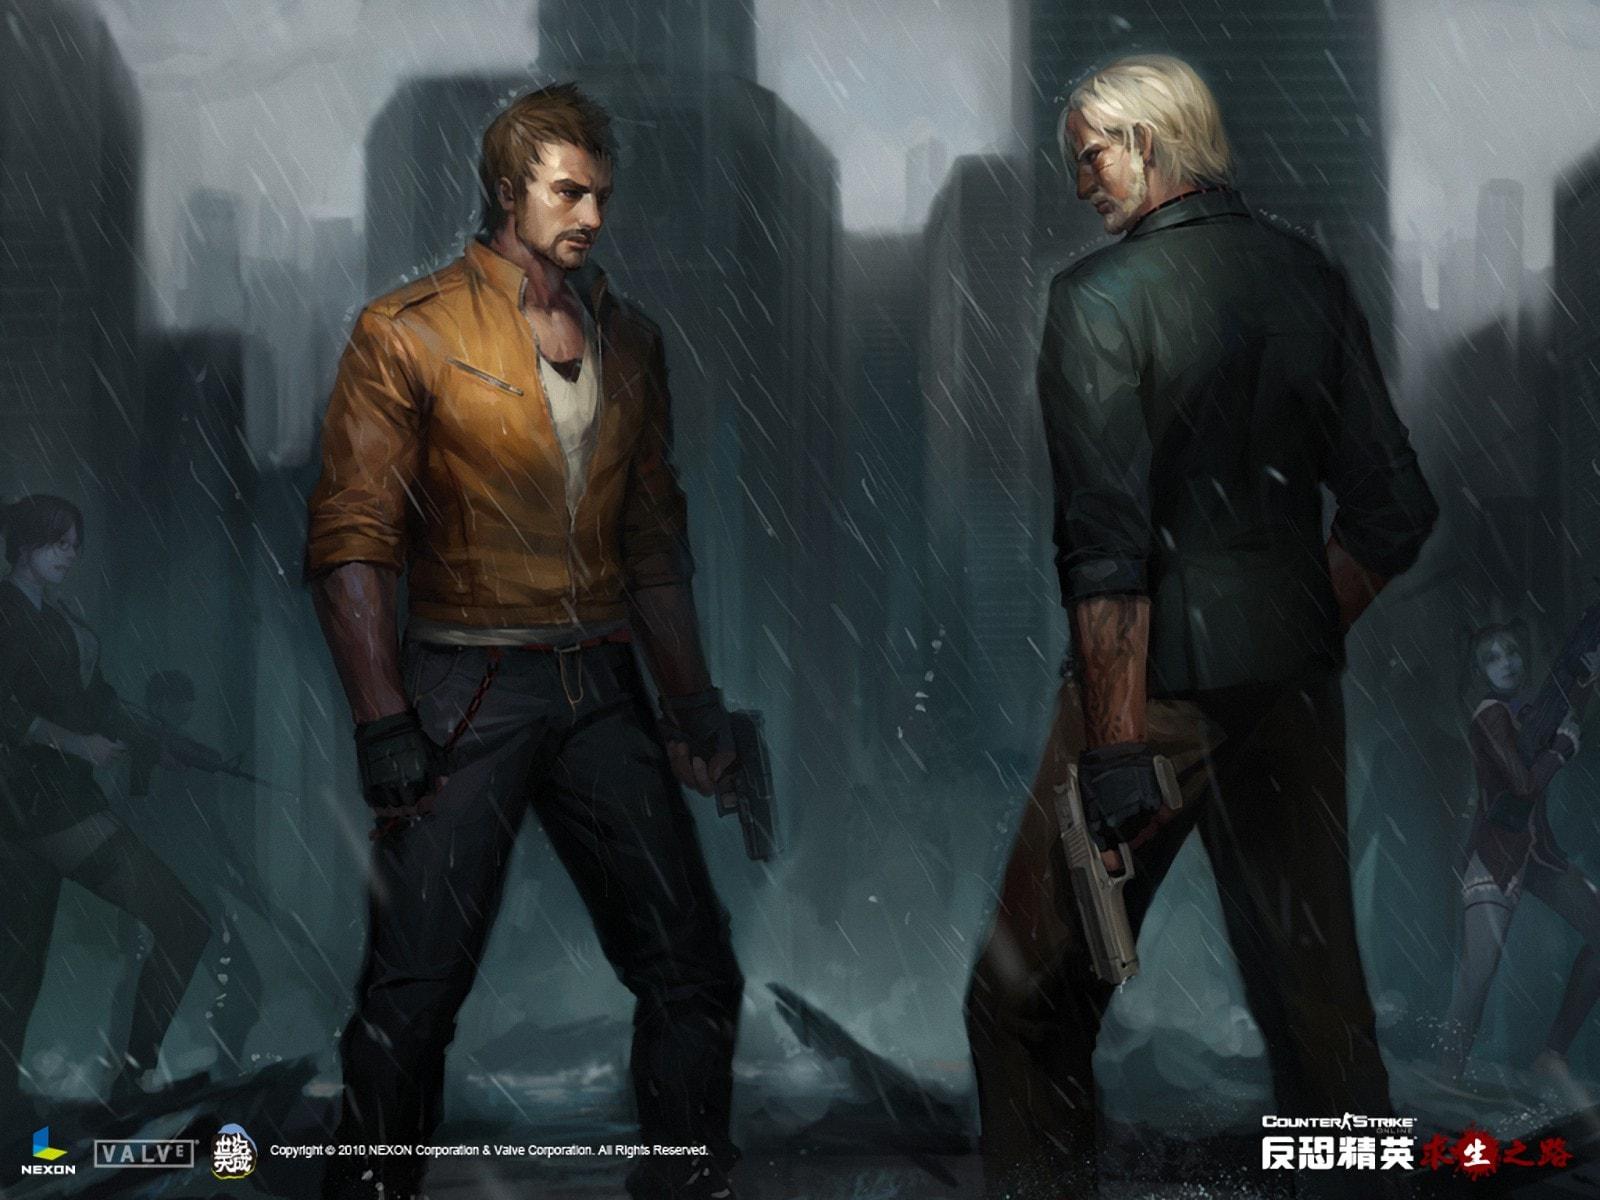 Counter-Strike Online Wallpaper